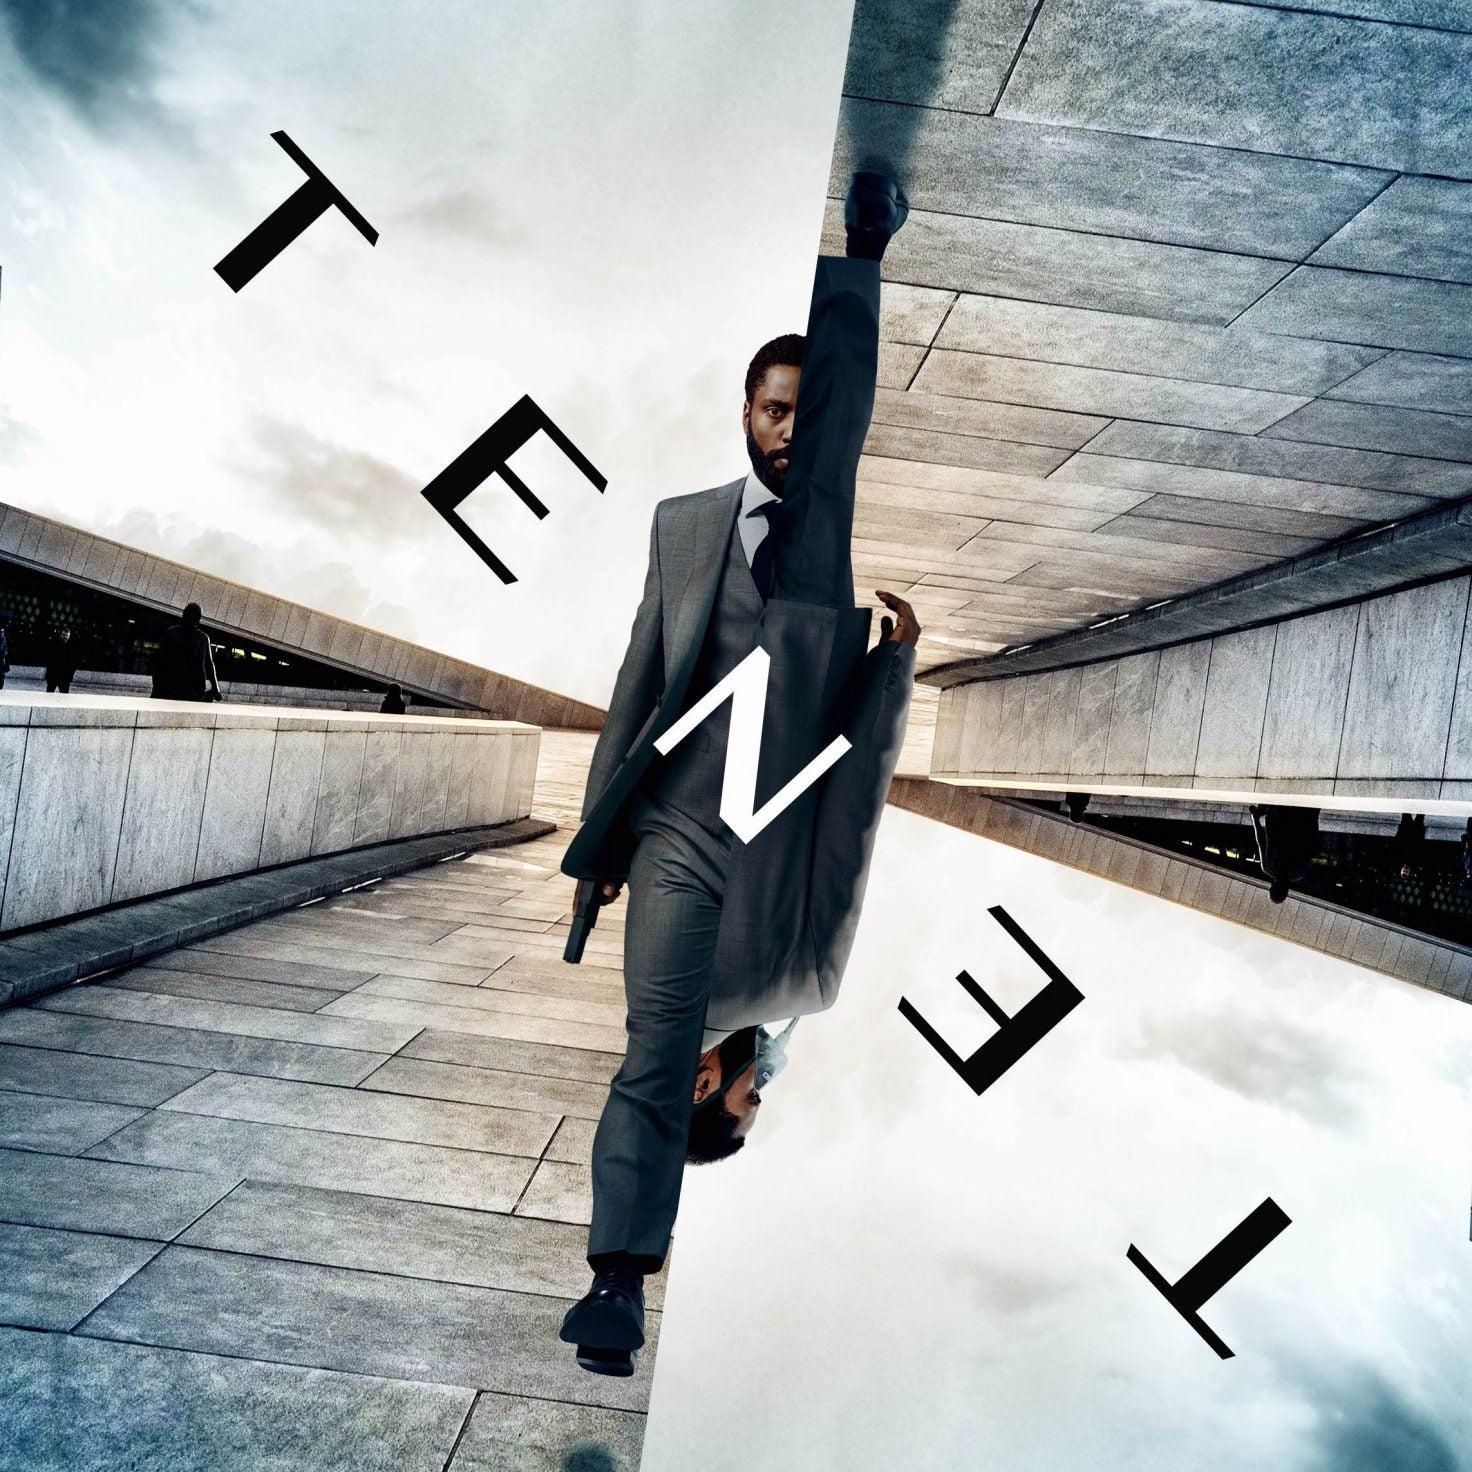 John David Washington Faces A Mysterious Threat In New 'Tenet' Trailer